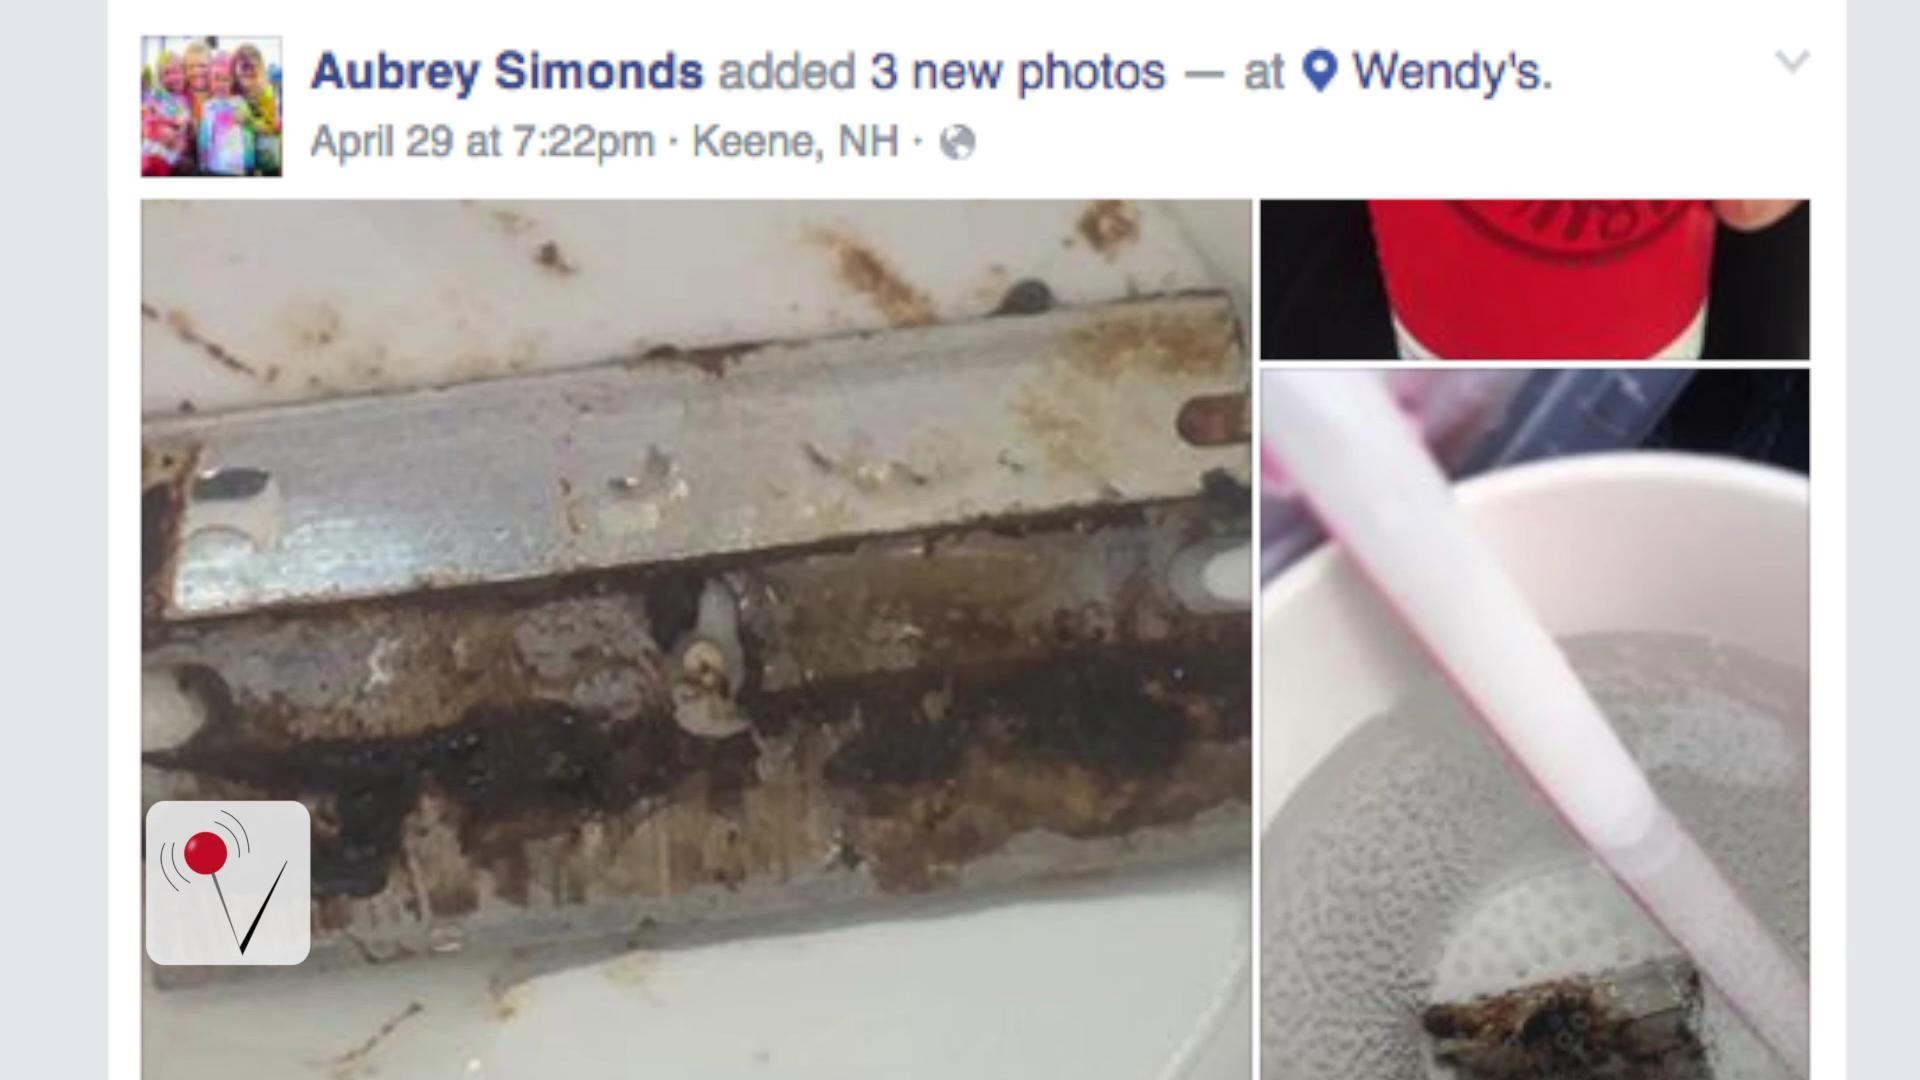 Razor Blade Found in Wendy's Soda Cup